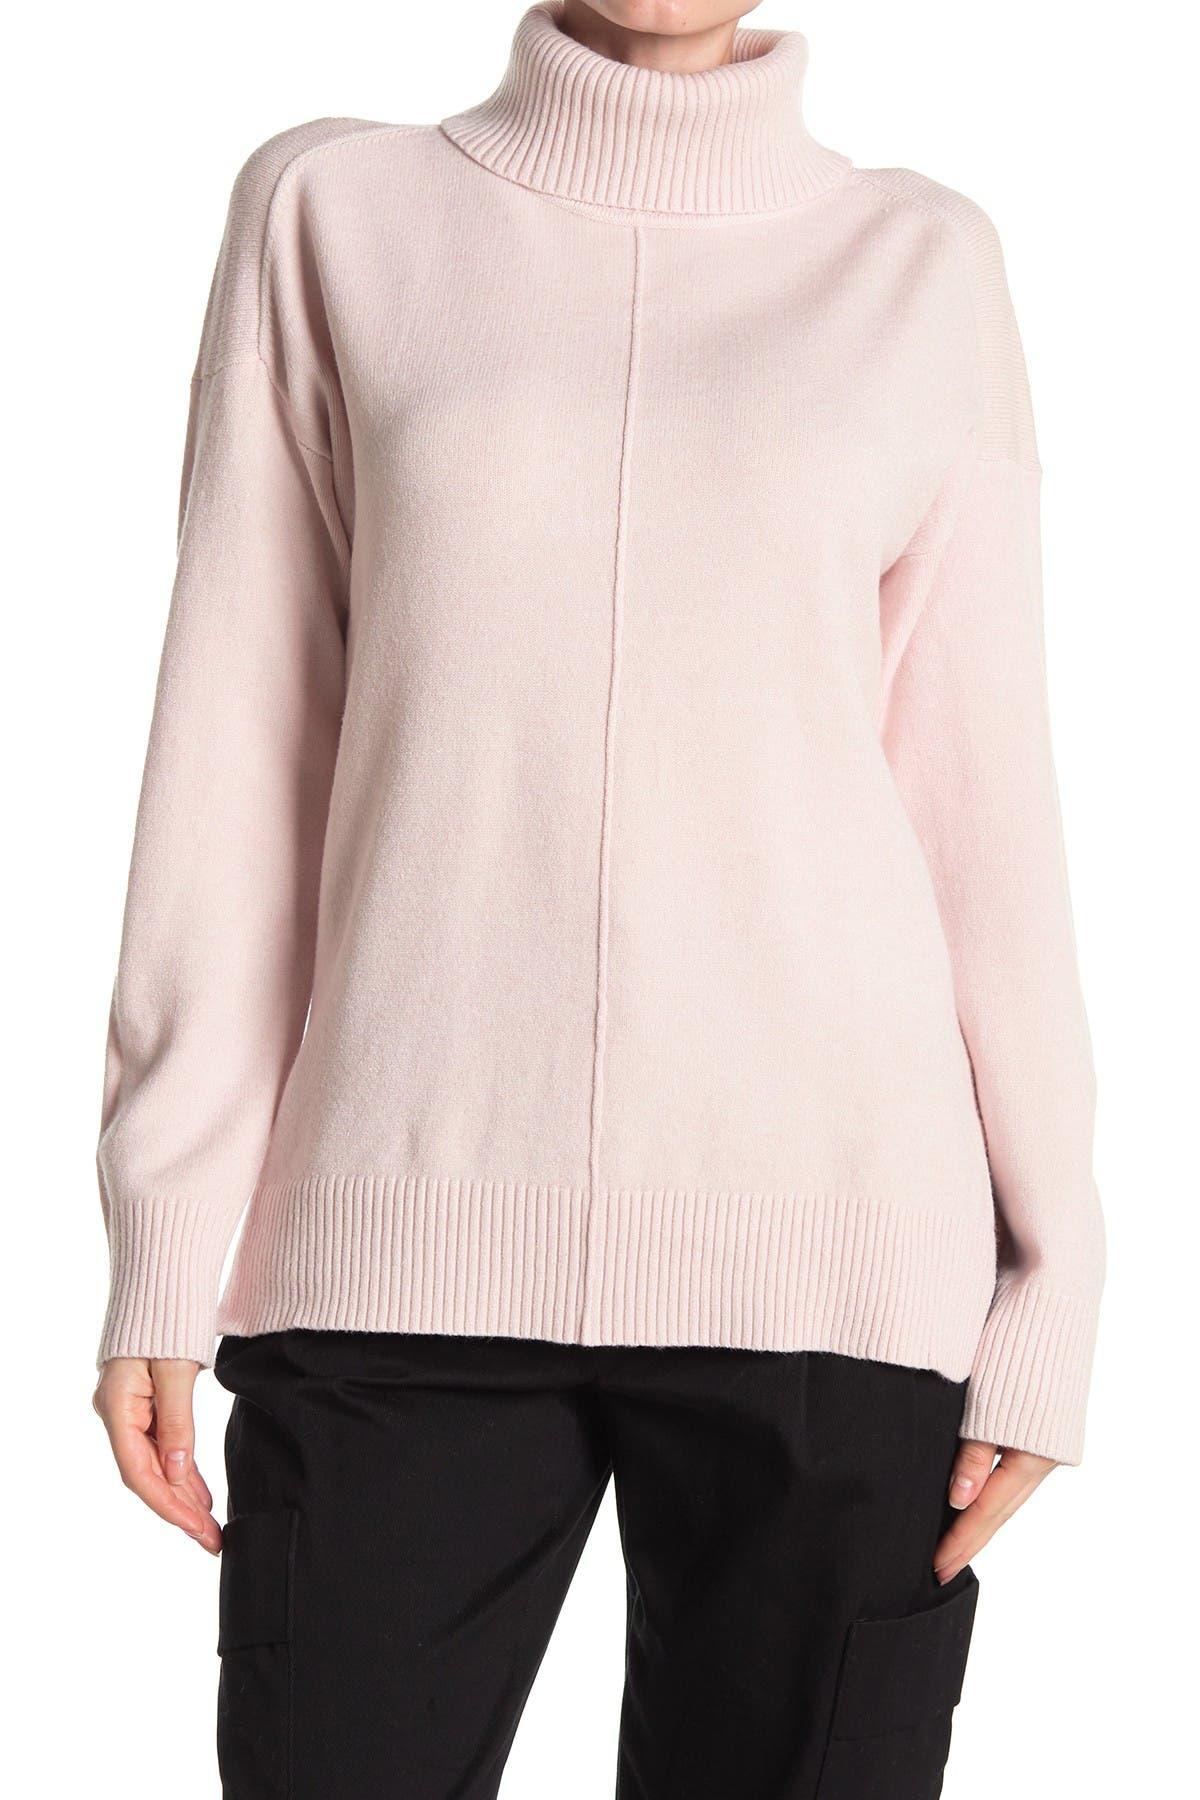 Image of Cyrus Turtleneck Dolman Sweater